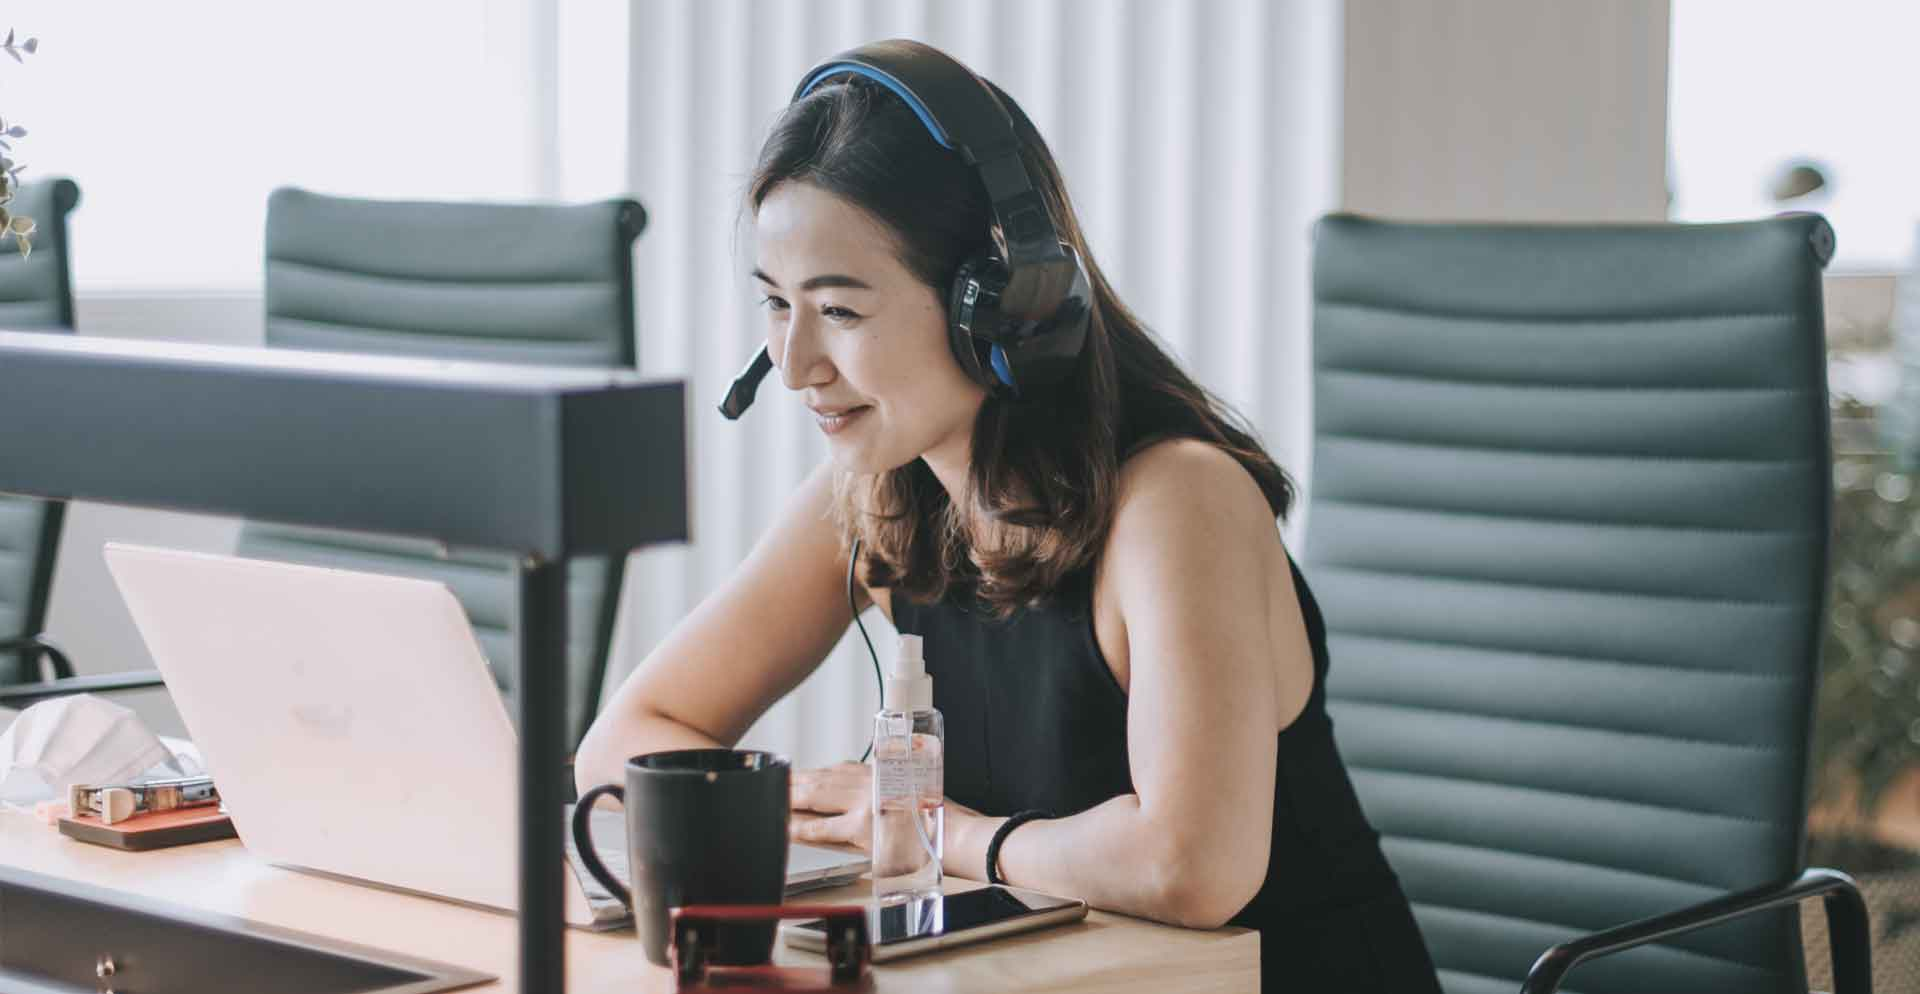 woman_watching_webinar_on_laptop_smiling_flipped_cropped